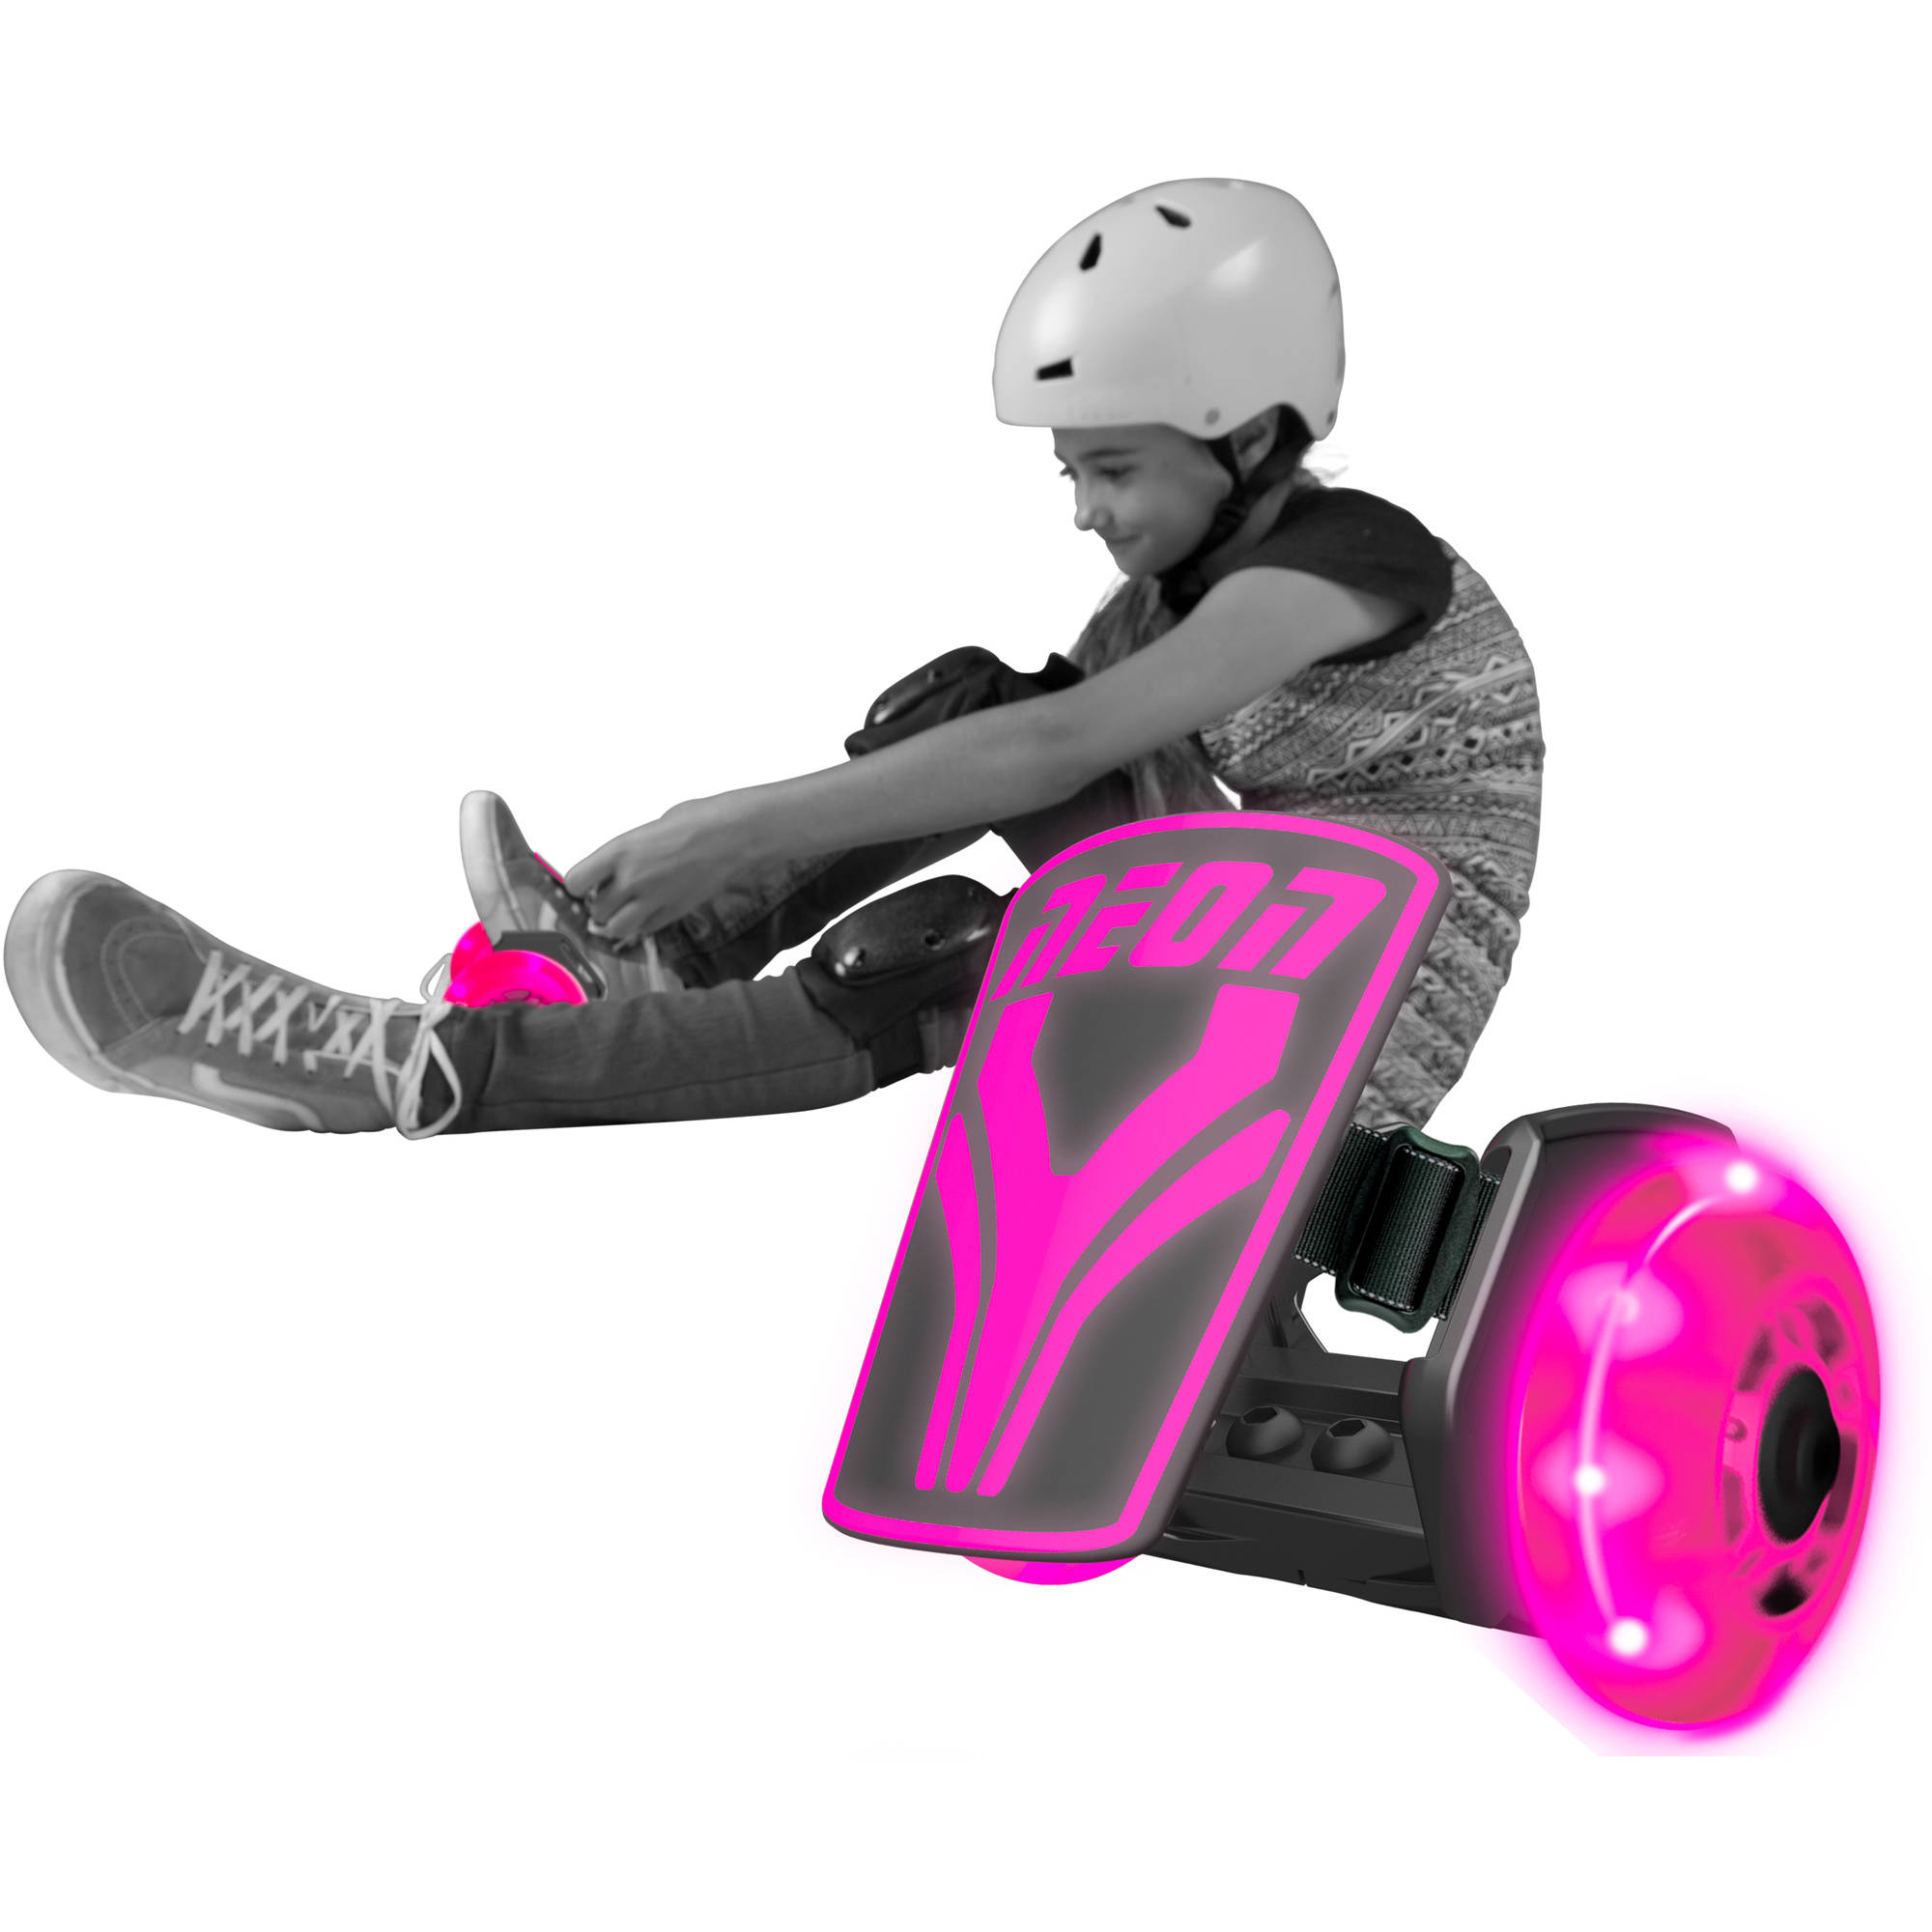 Chicago roller skates walmart - Yvolution Neon Street Roller Pink